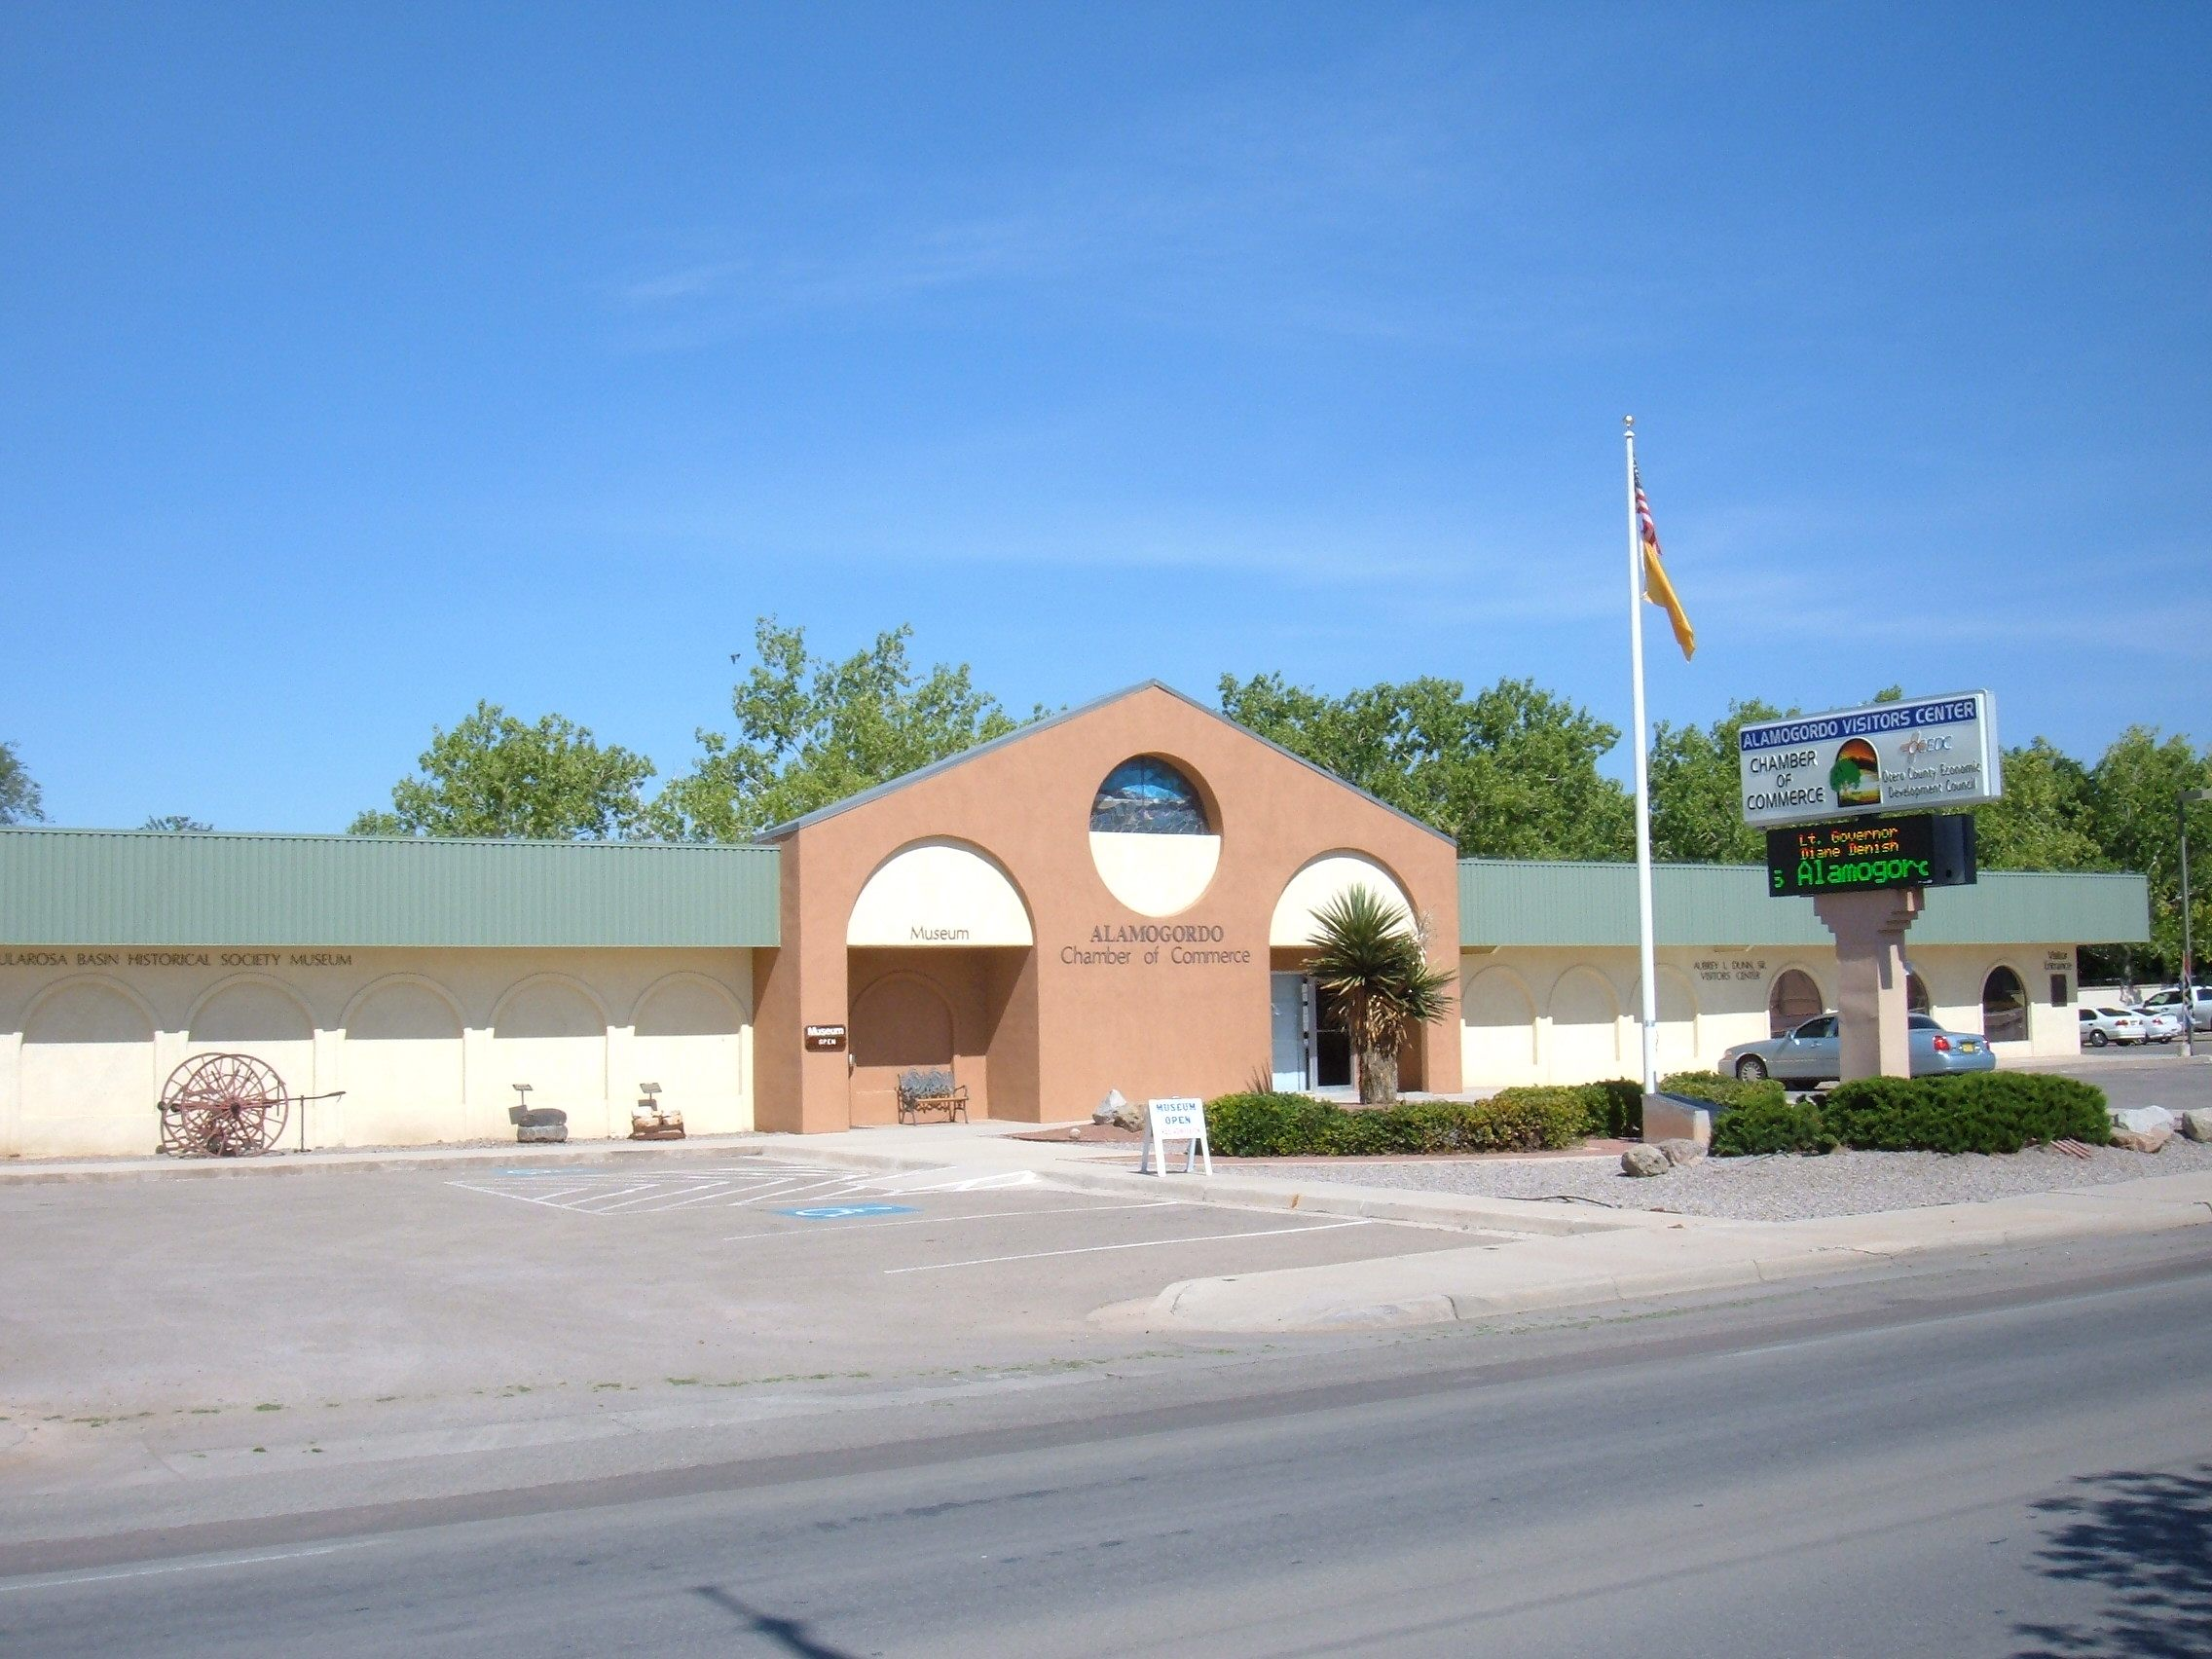 Alamogordo Chamber of Commerce